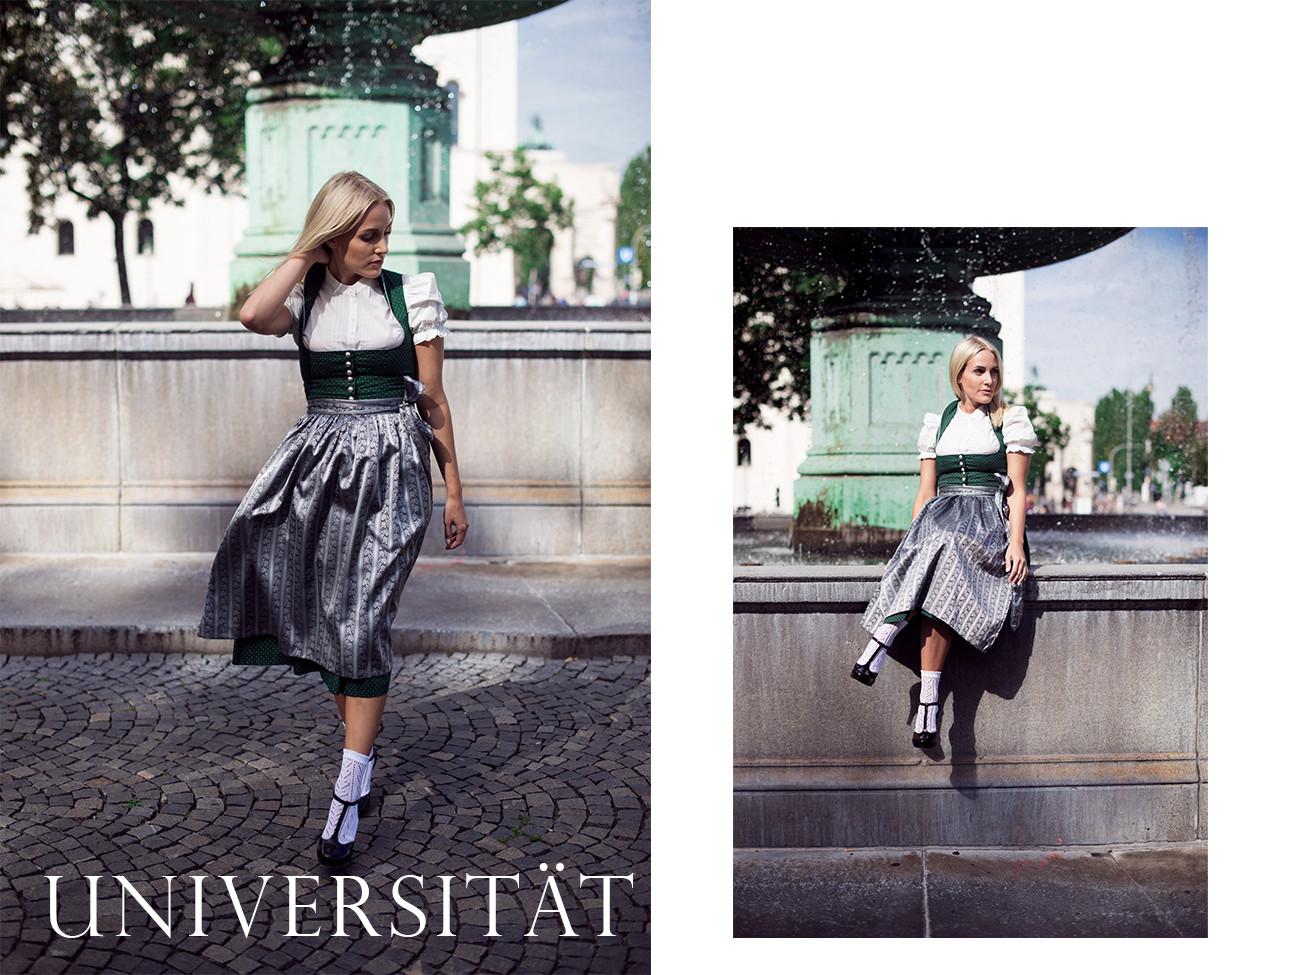 Universität-Munich-Dirndl-AmazonFashion-Fashionblogger-Sequinsophia-3-Unbenannt-12